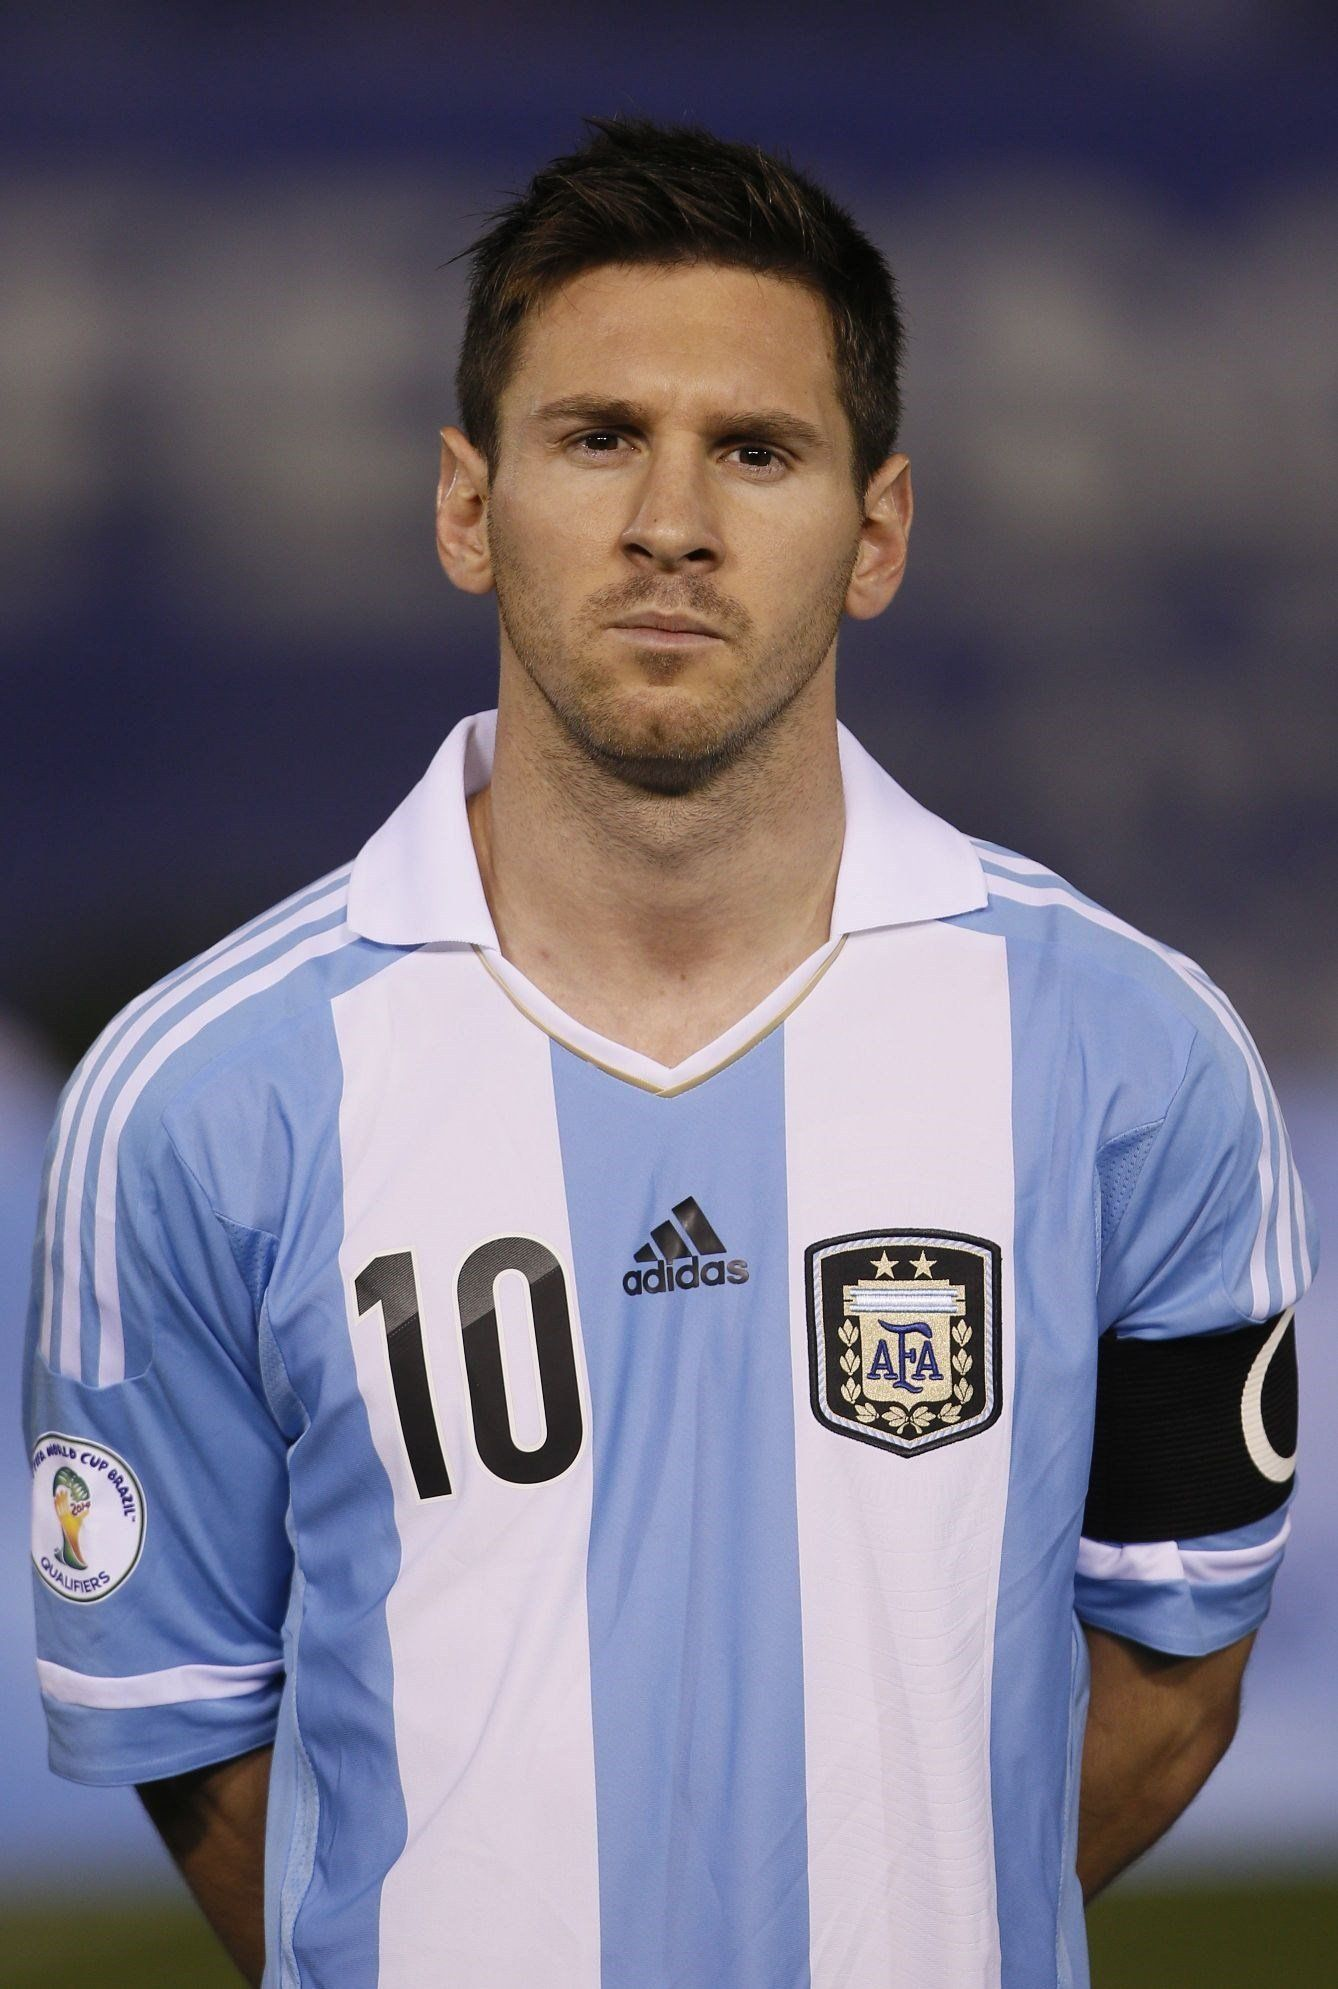 f4f860da8 Lionel Messi - Argentina!!!!!!!!!!!!!!!!!!!!!!!!!!!!!!!!!